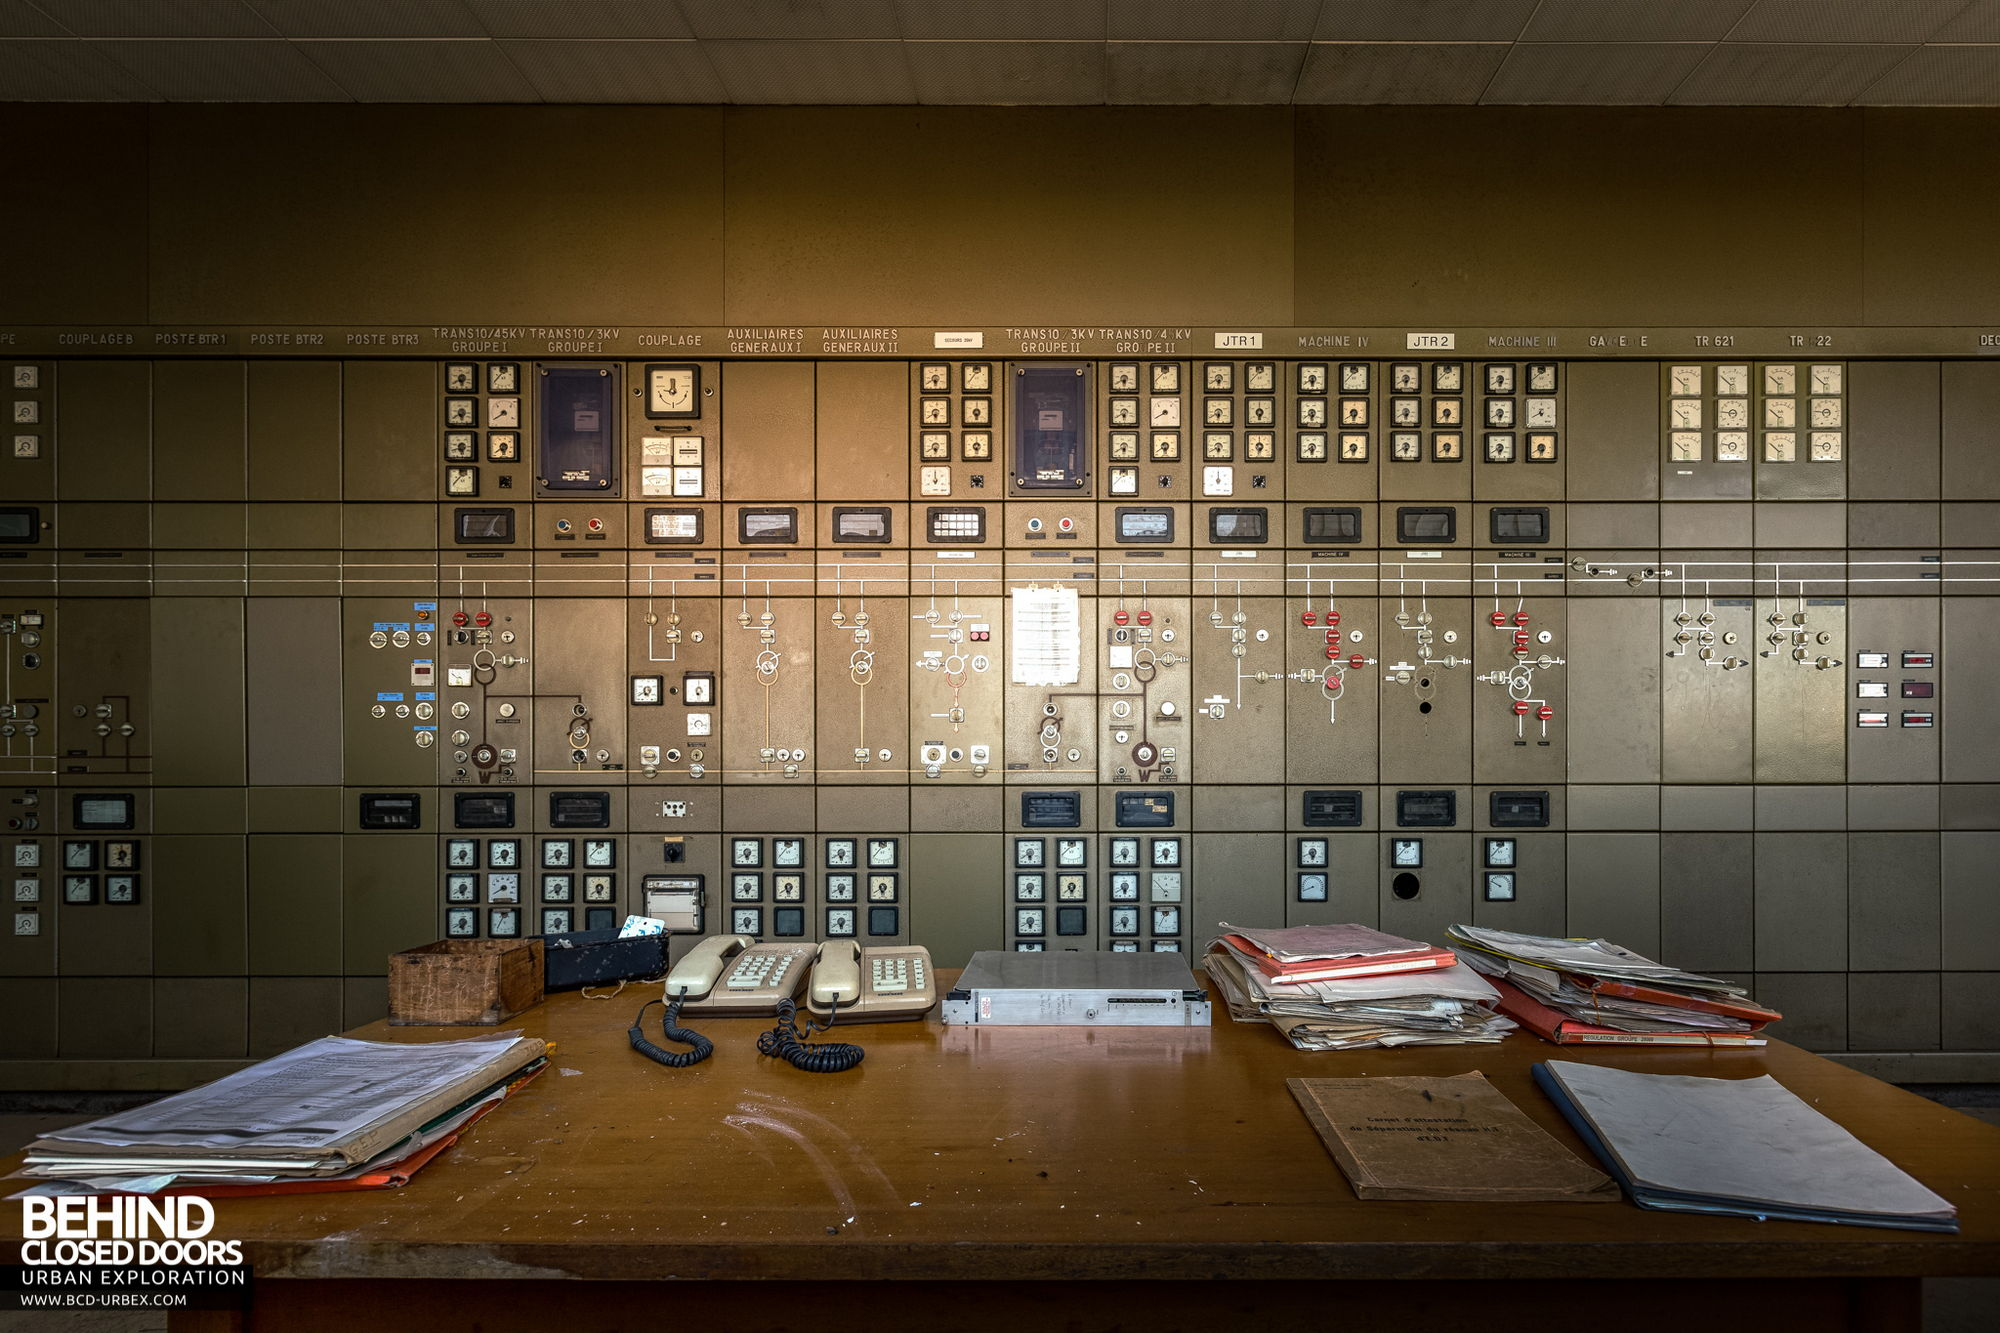 Stora Enso, Corbehem - Grid commander's desk